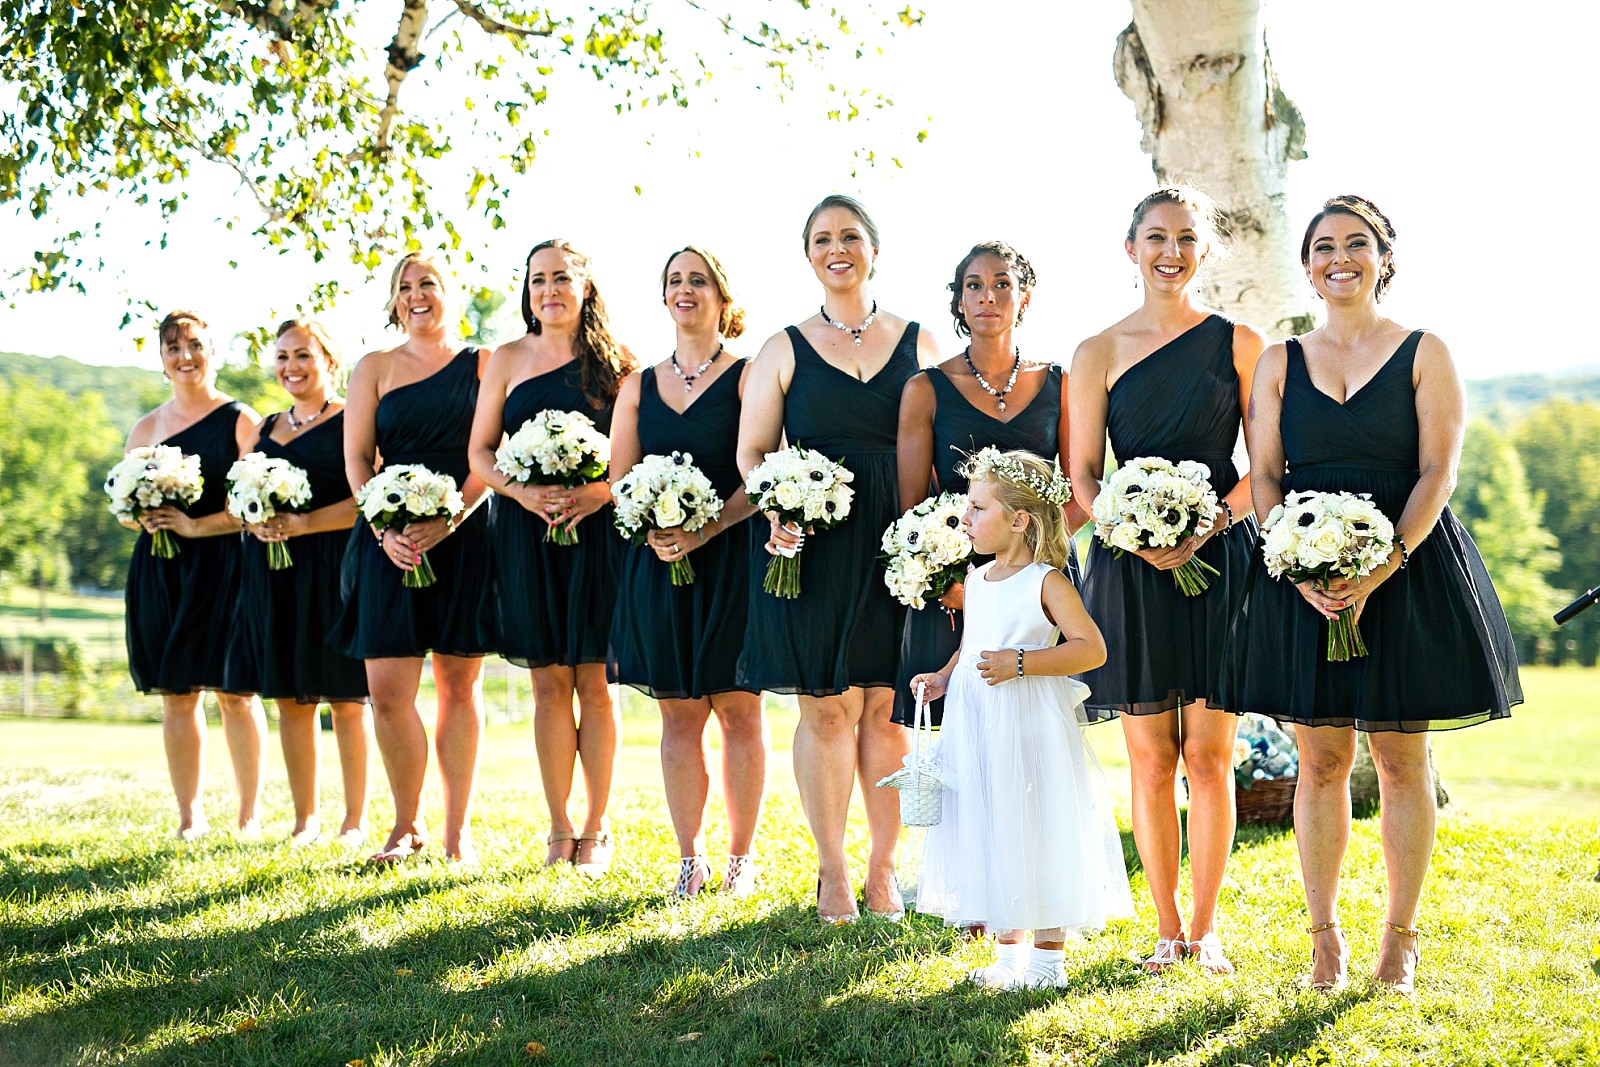 CT_Wedding_Photographer_LiNa_Wed_37.jpg